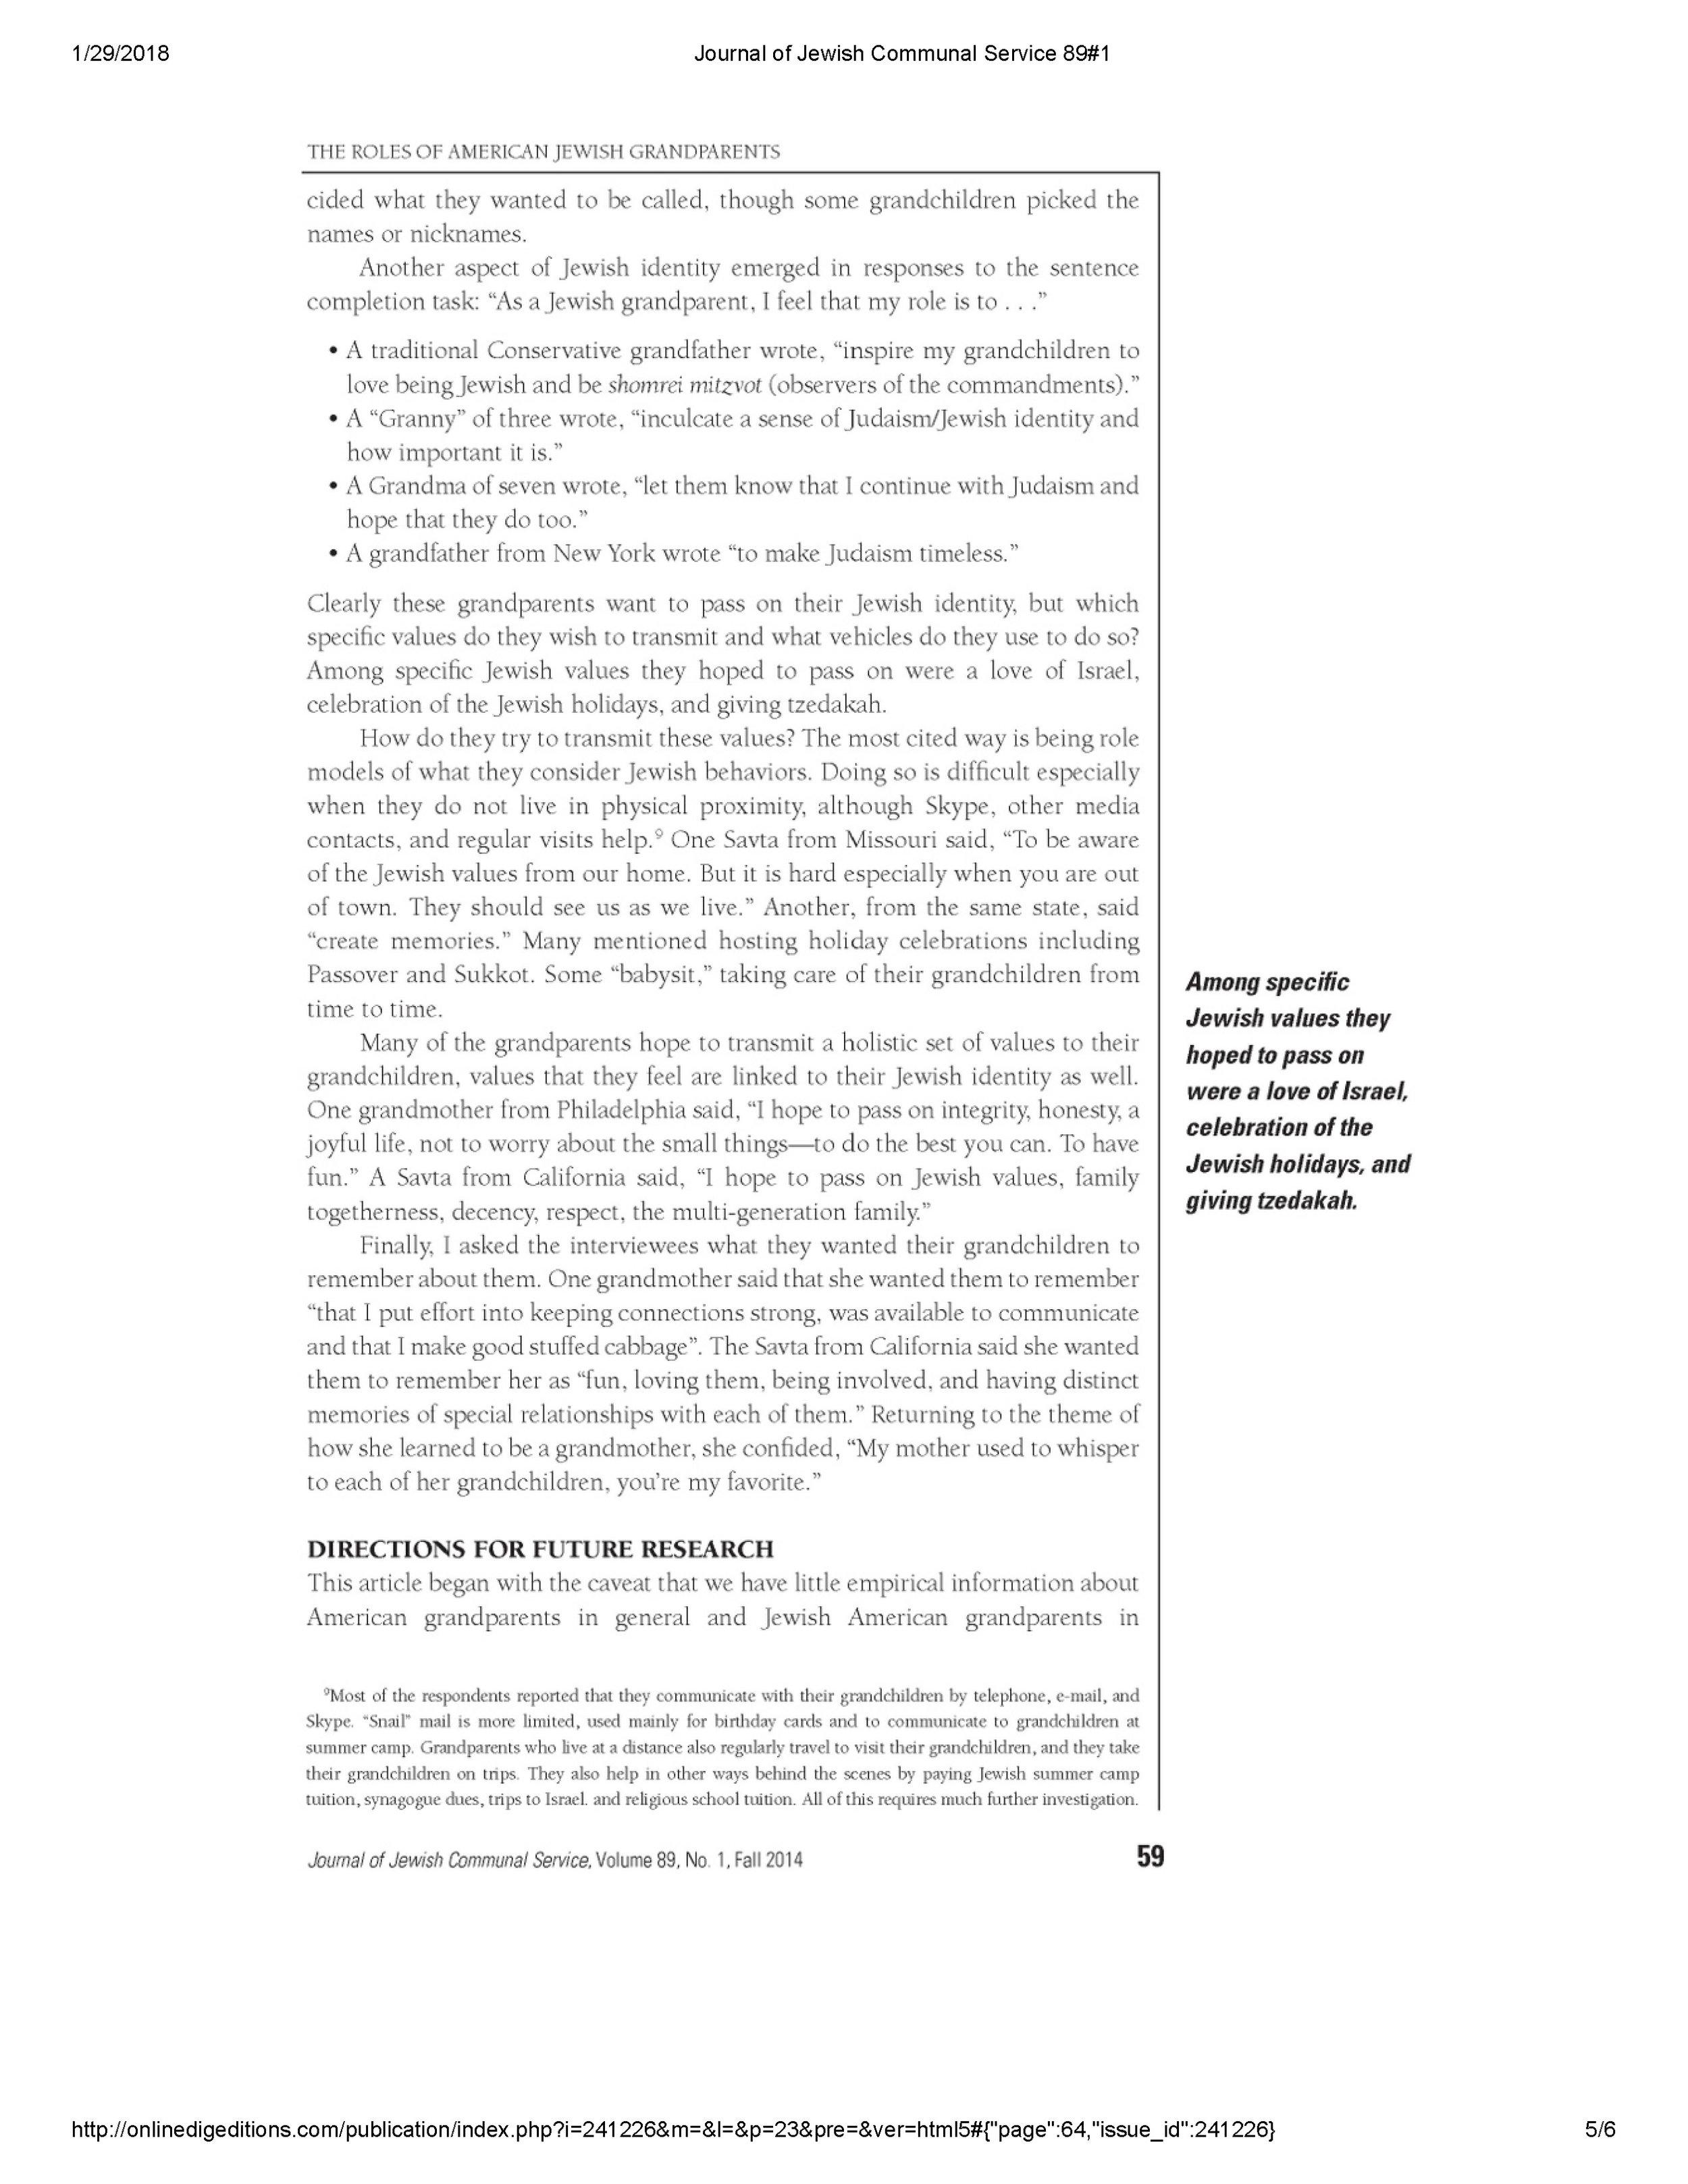 Journal of Jewish Communal Service 89#1_Page_5.jpg